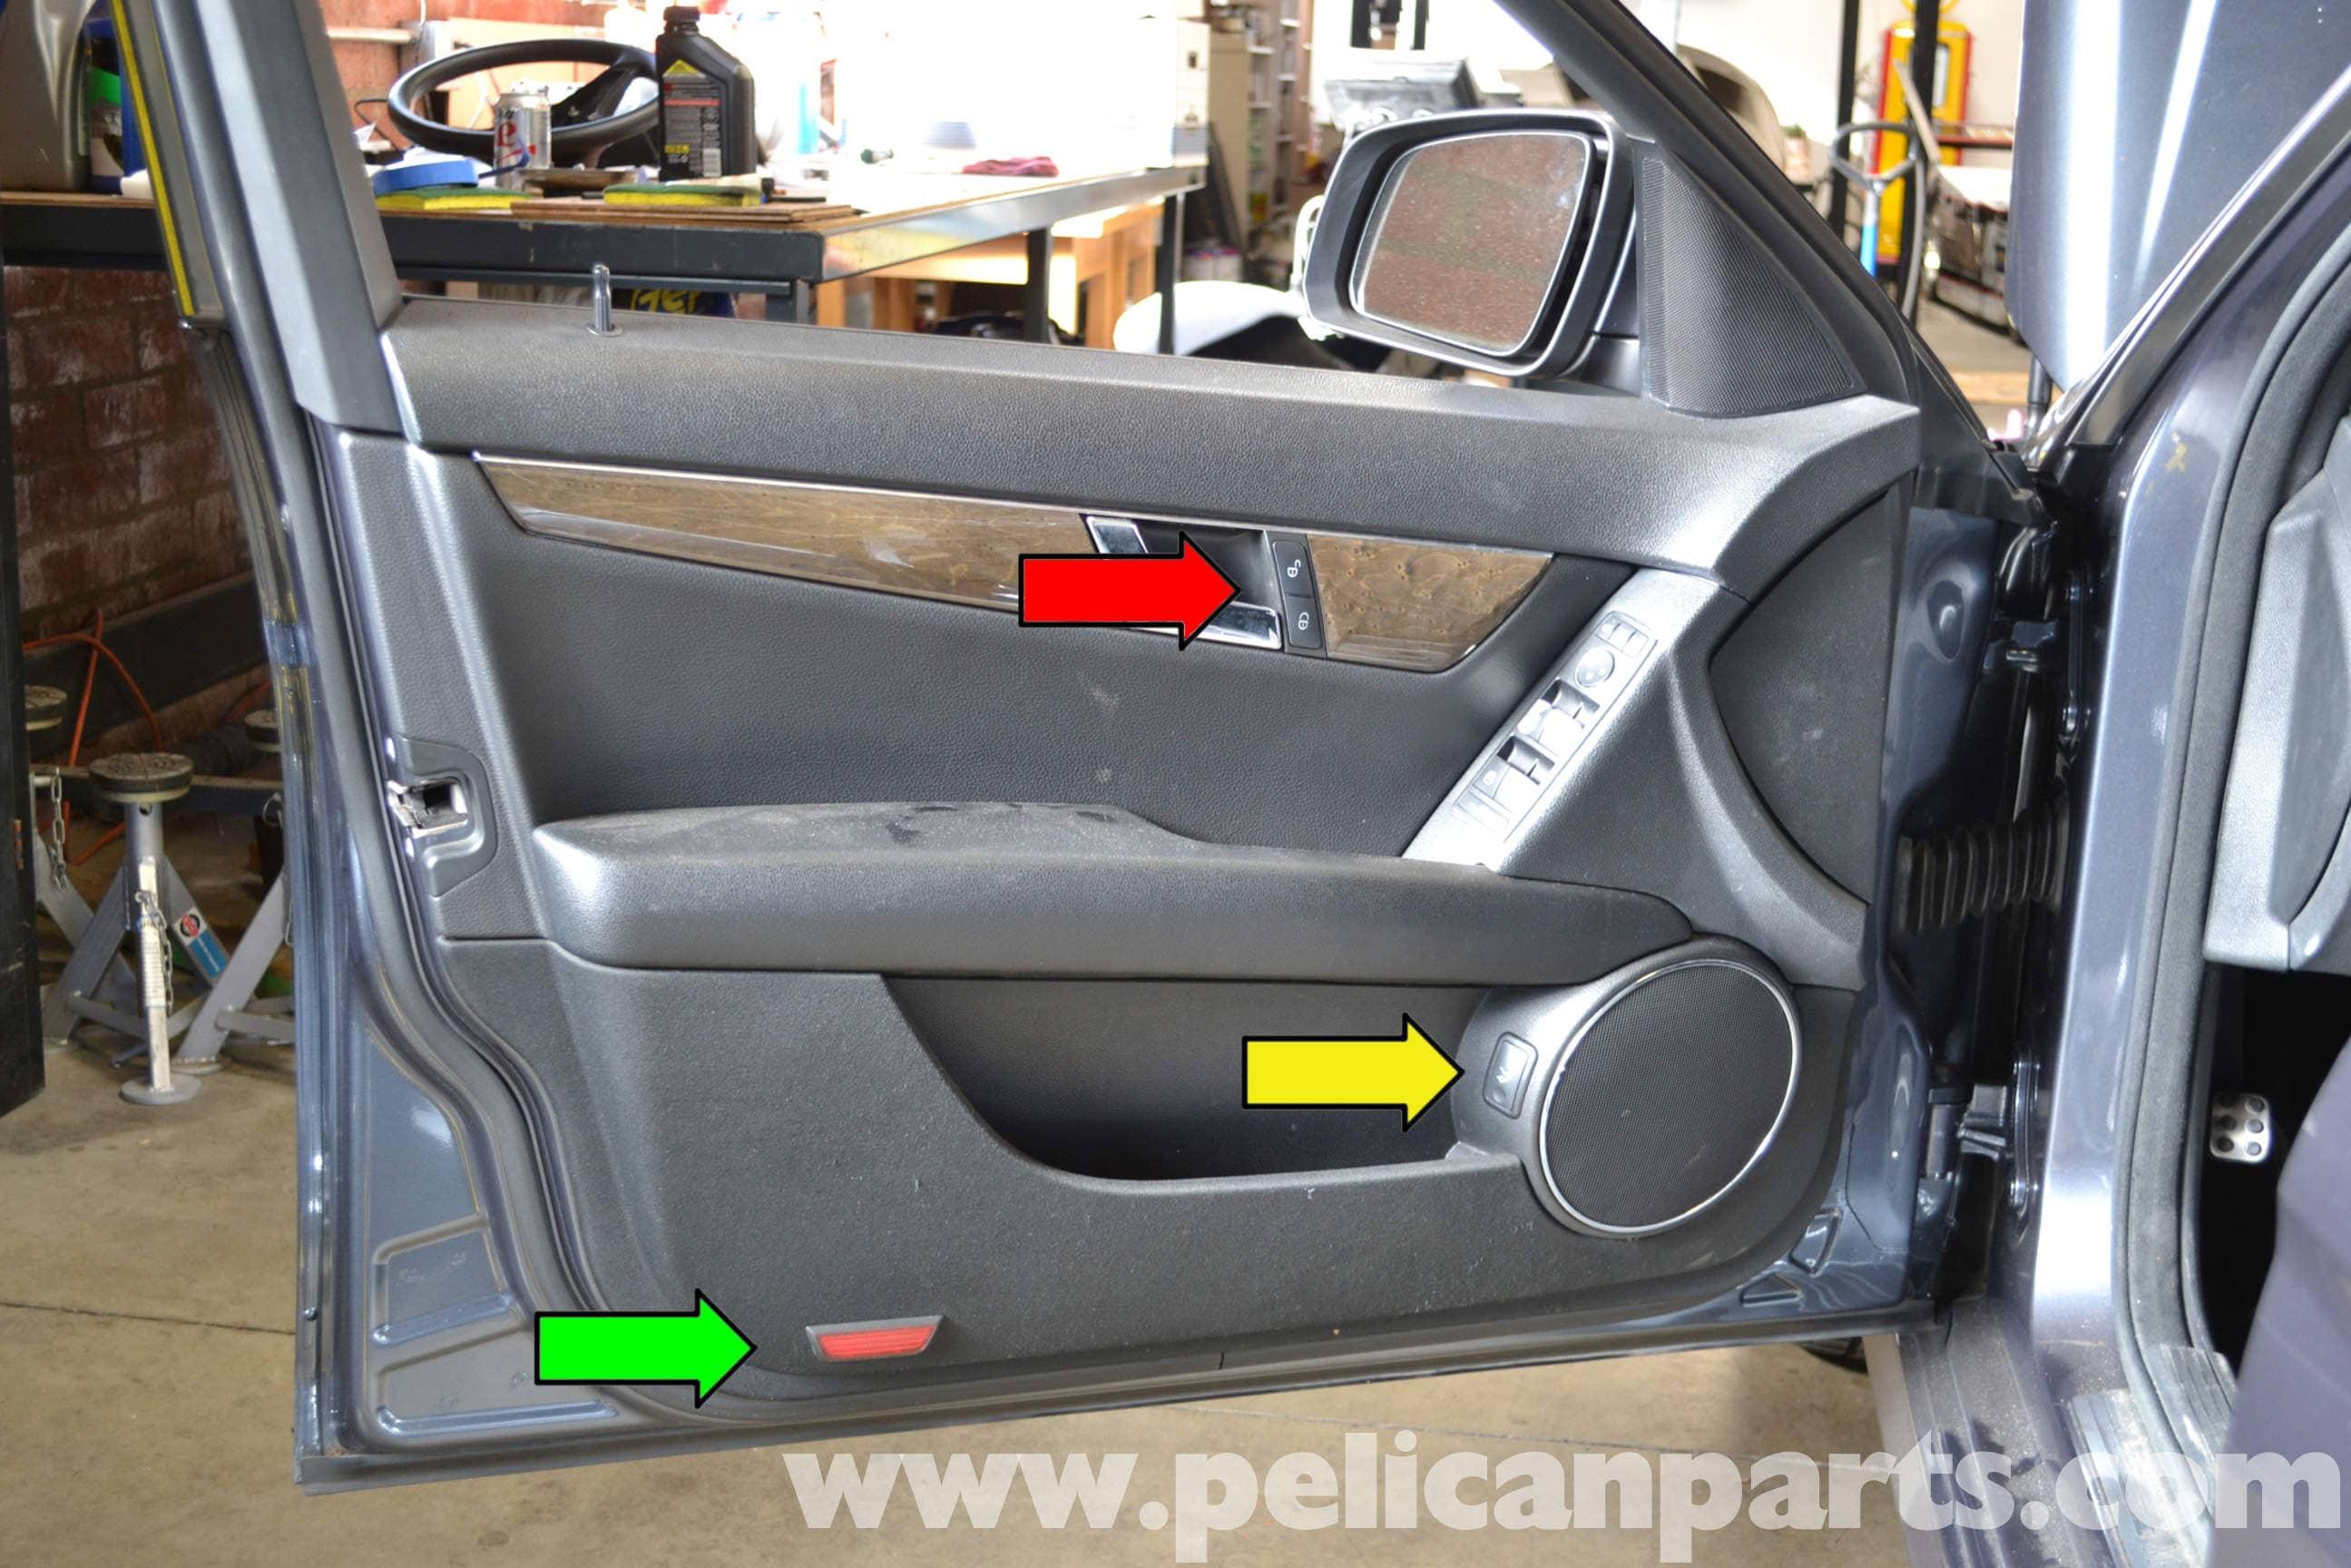 Mercedes Benz W204 Door Panel Light And Switch Replacement 2008 2014 C250 C300 C350